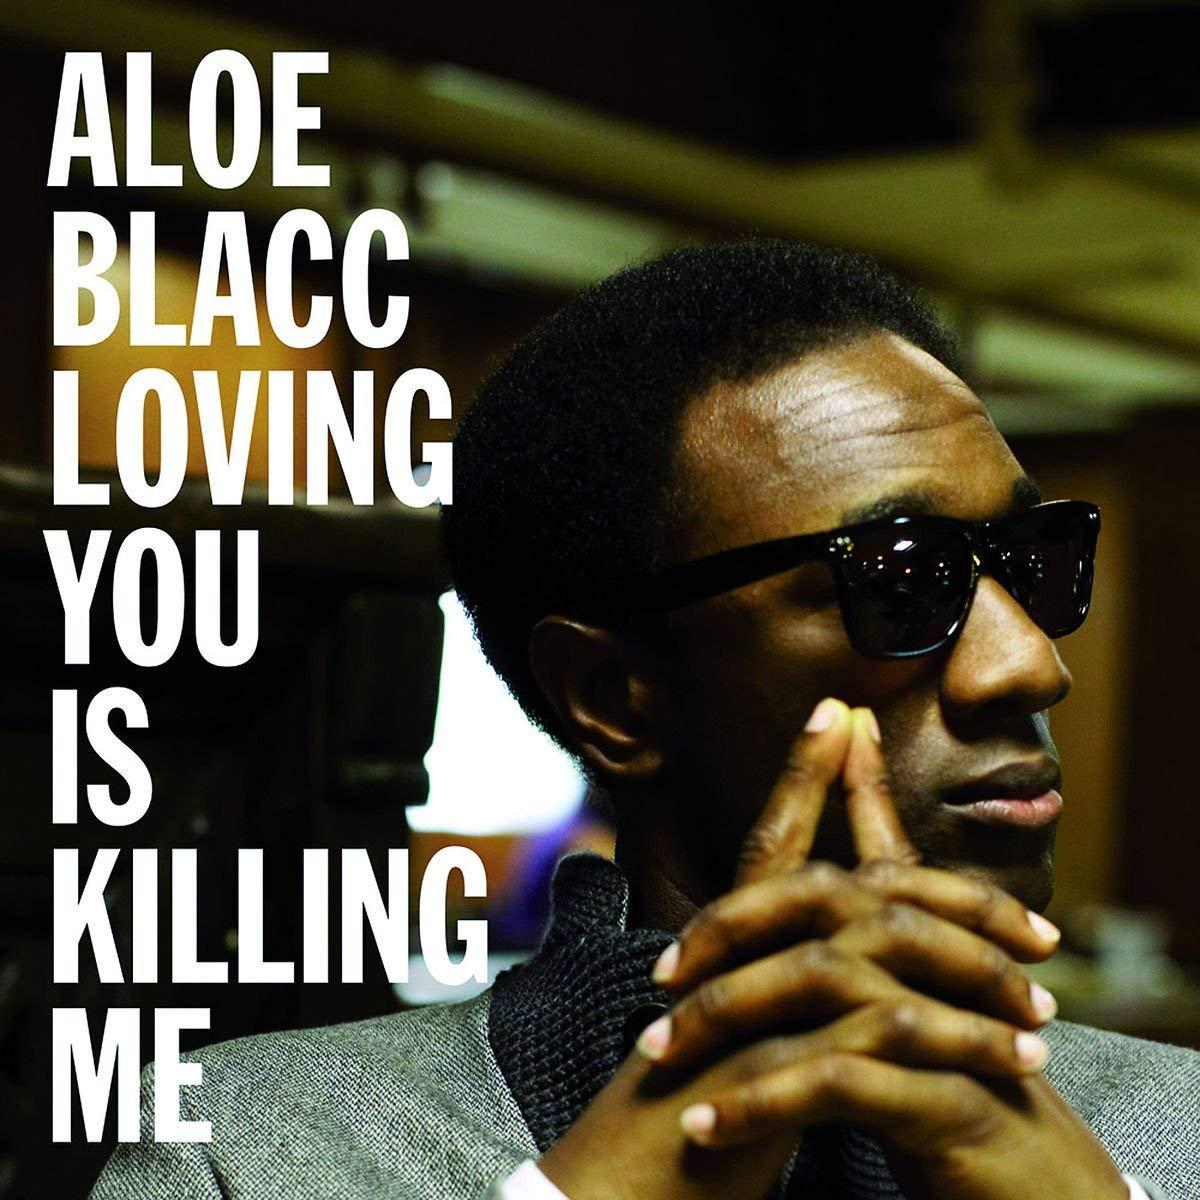 Aloe Blacc, Loving You Is Killing Me, Permanent Vacation.jpg